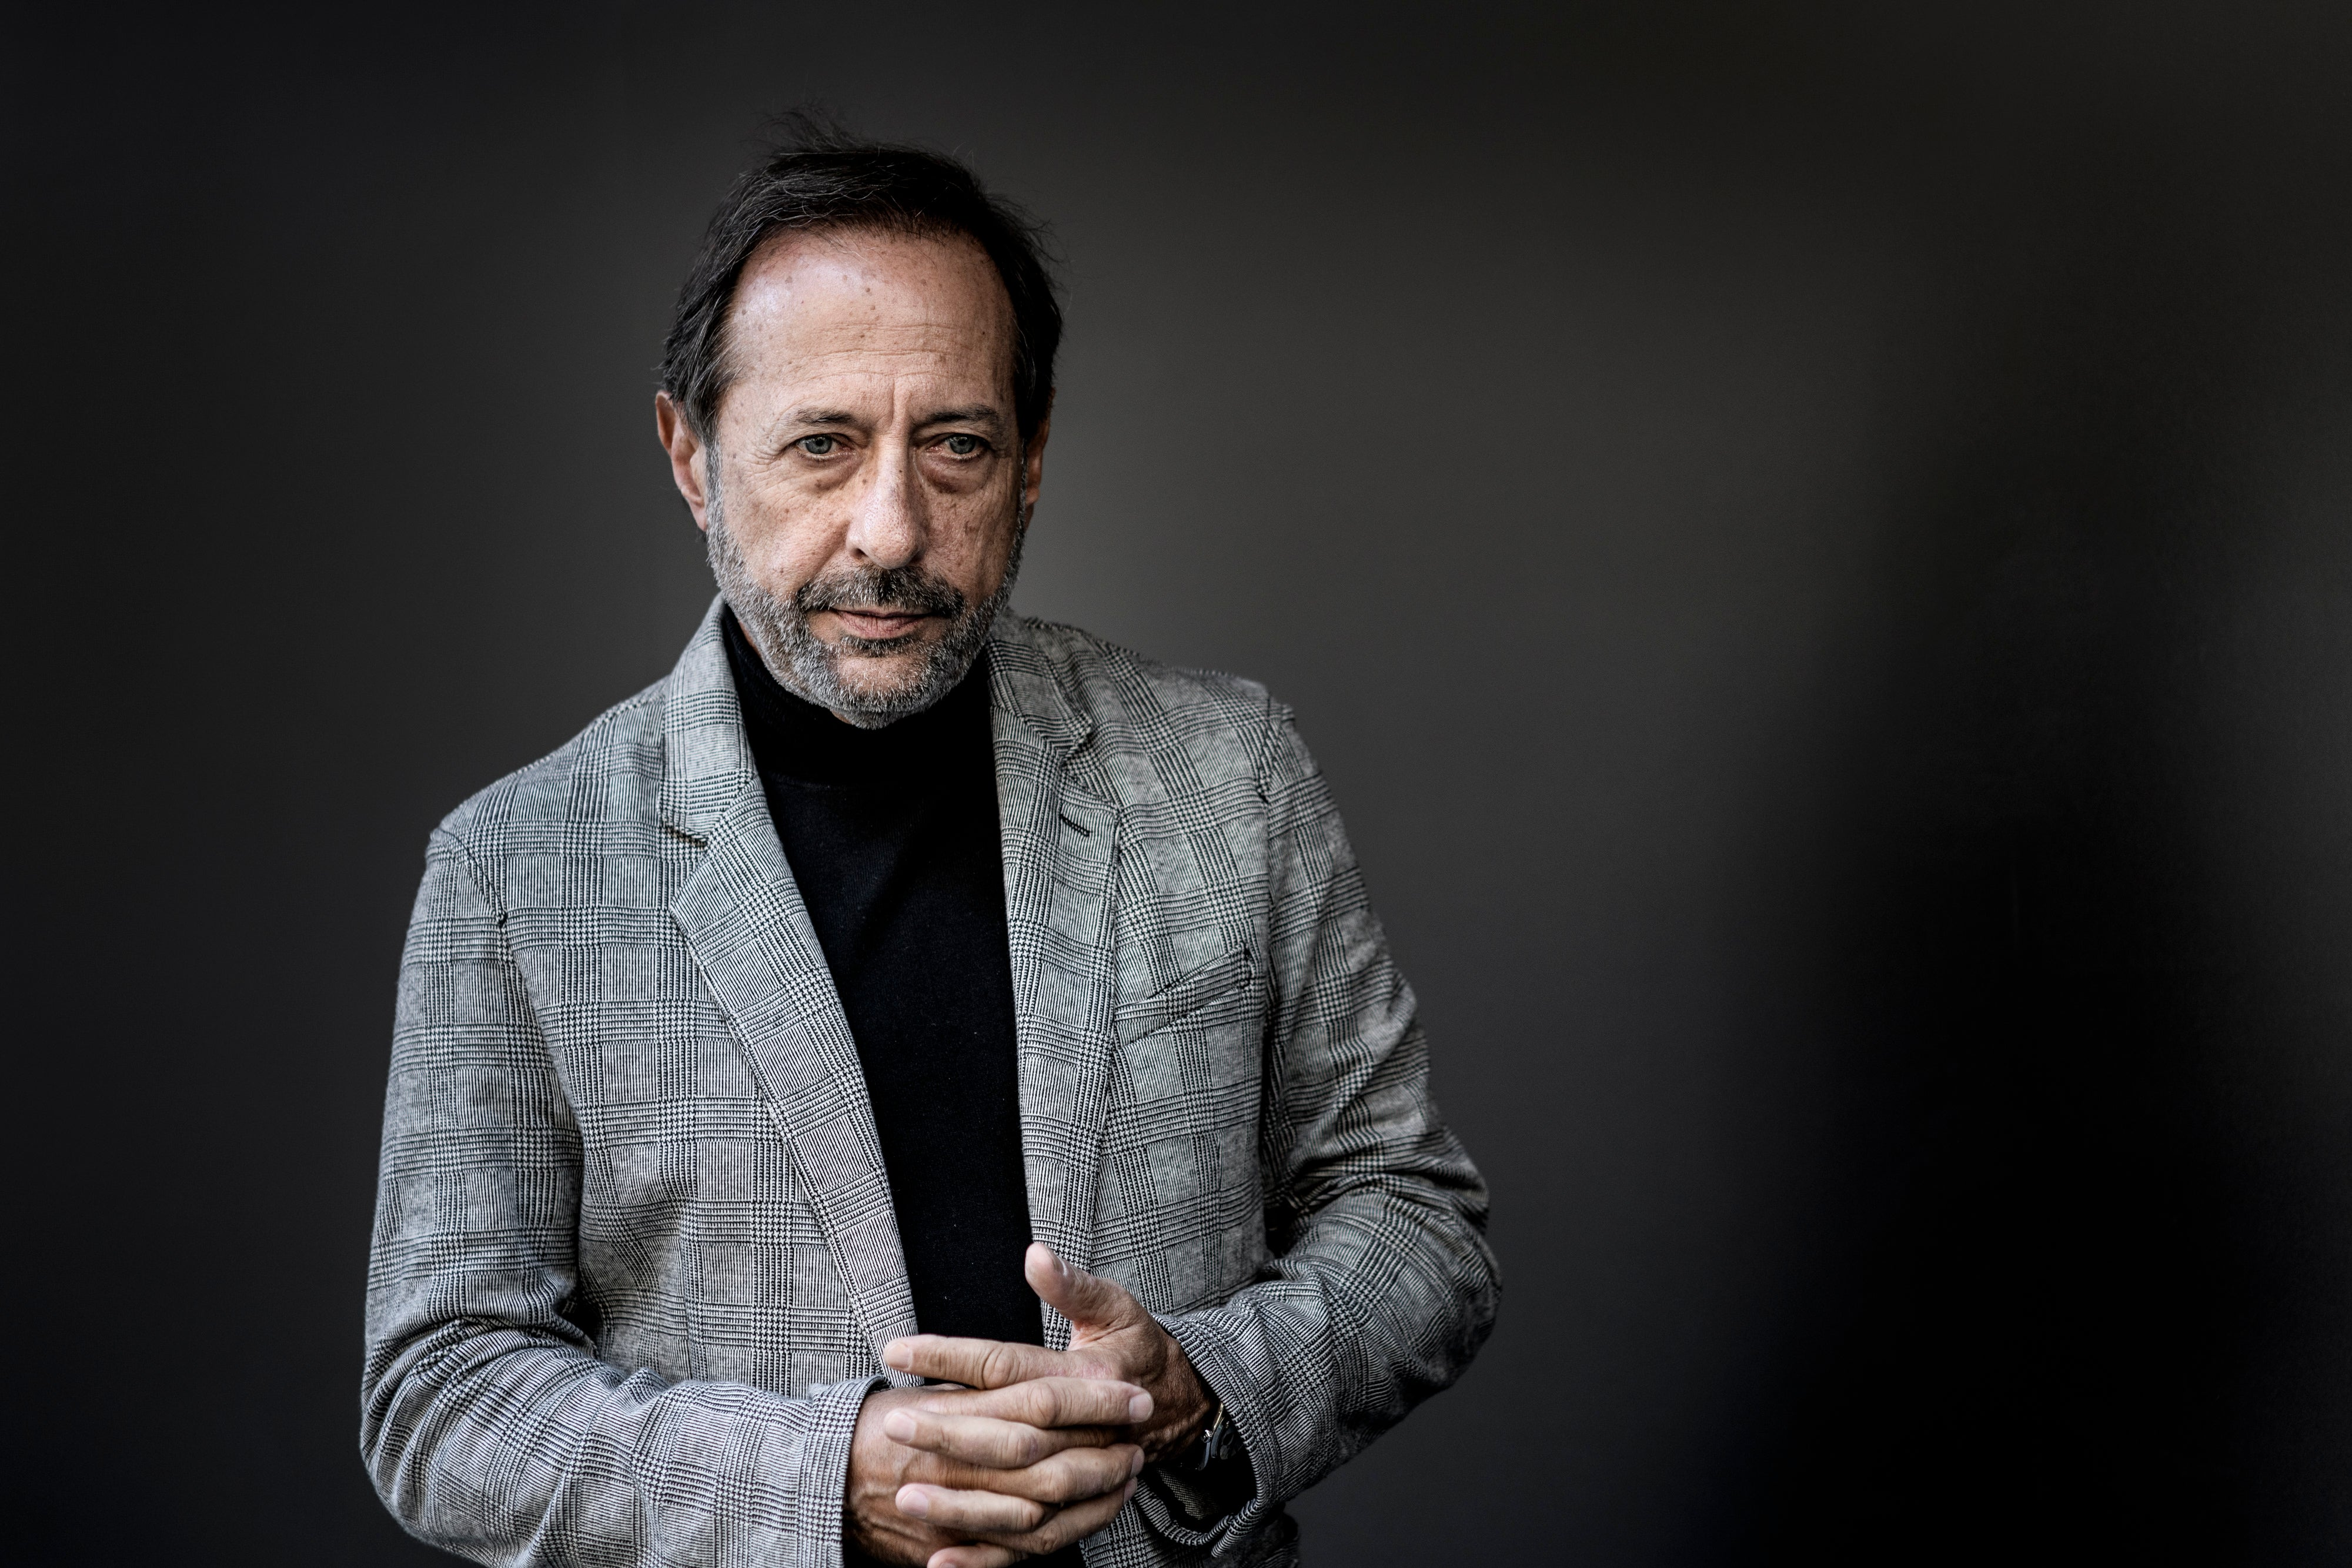 Argentine actor Guillermo Francella